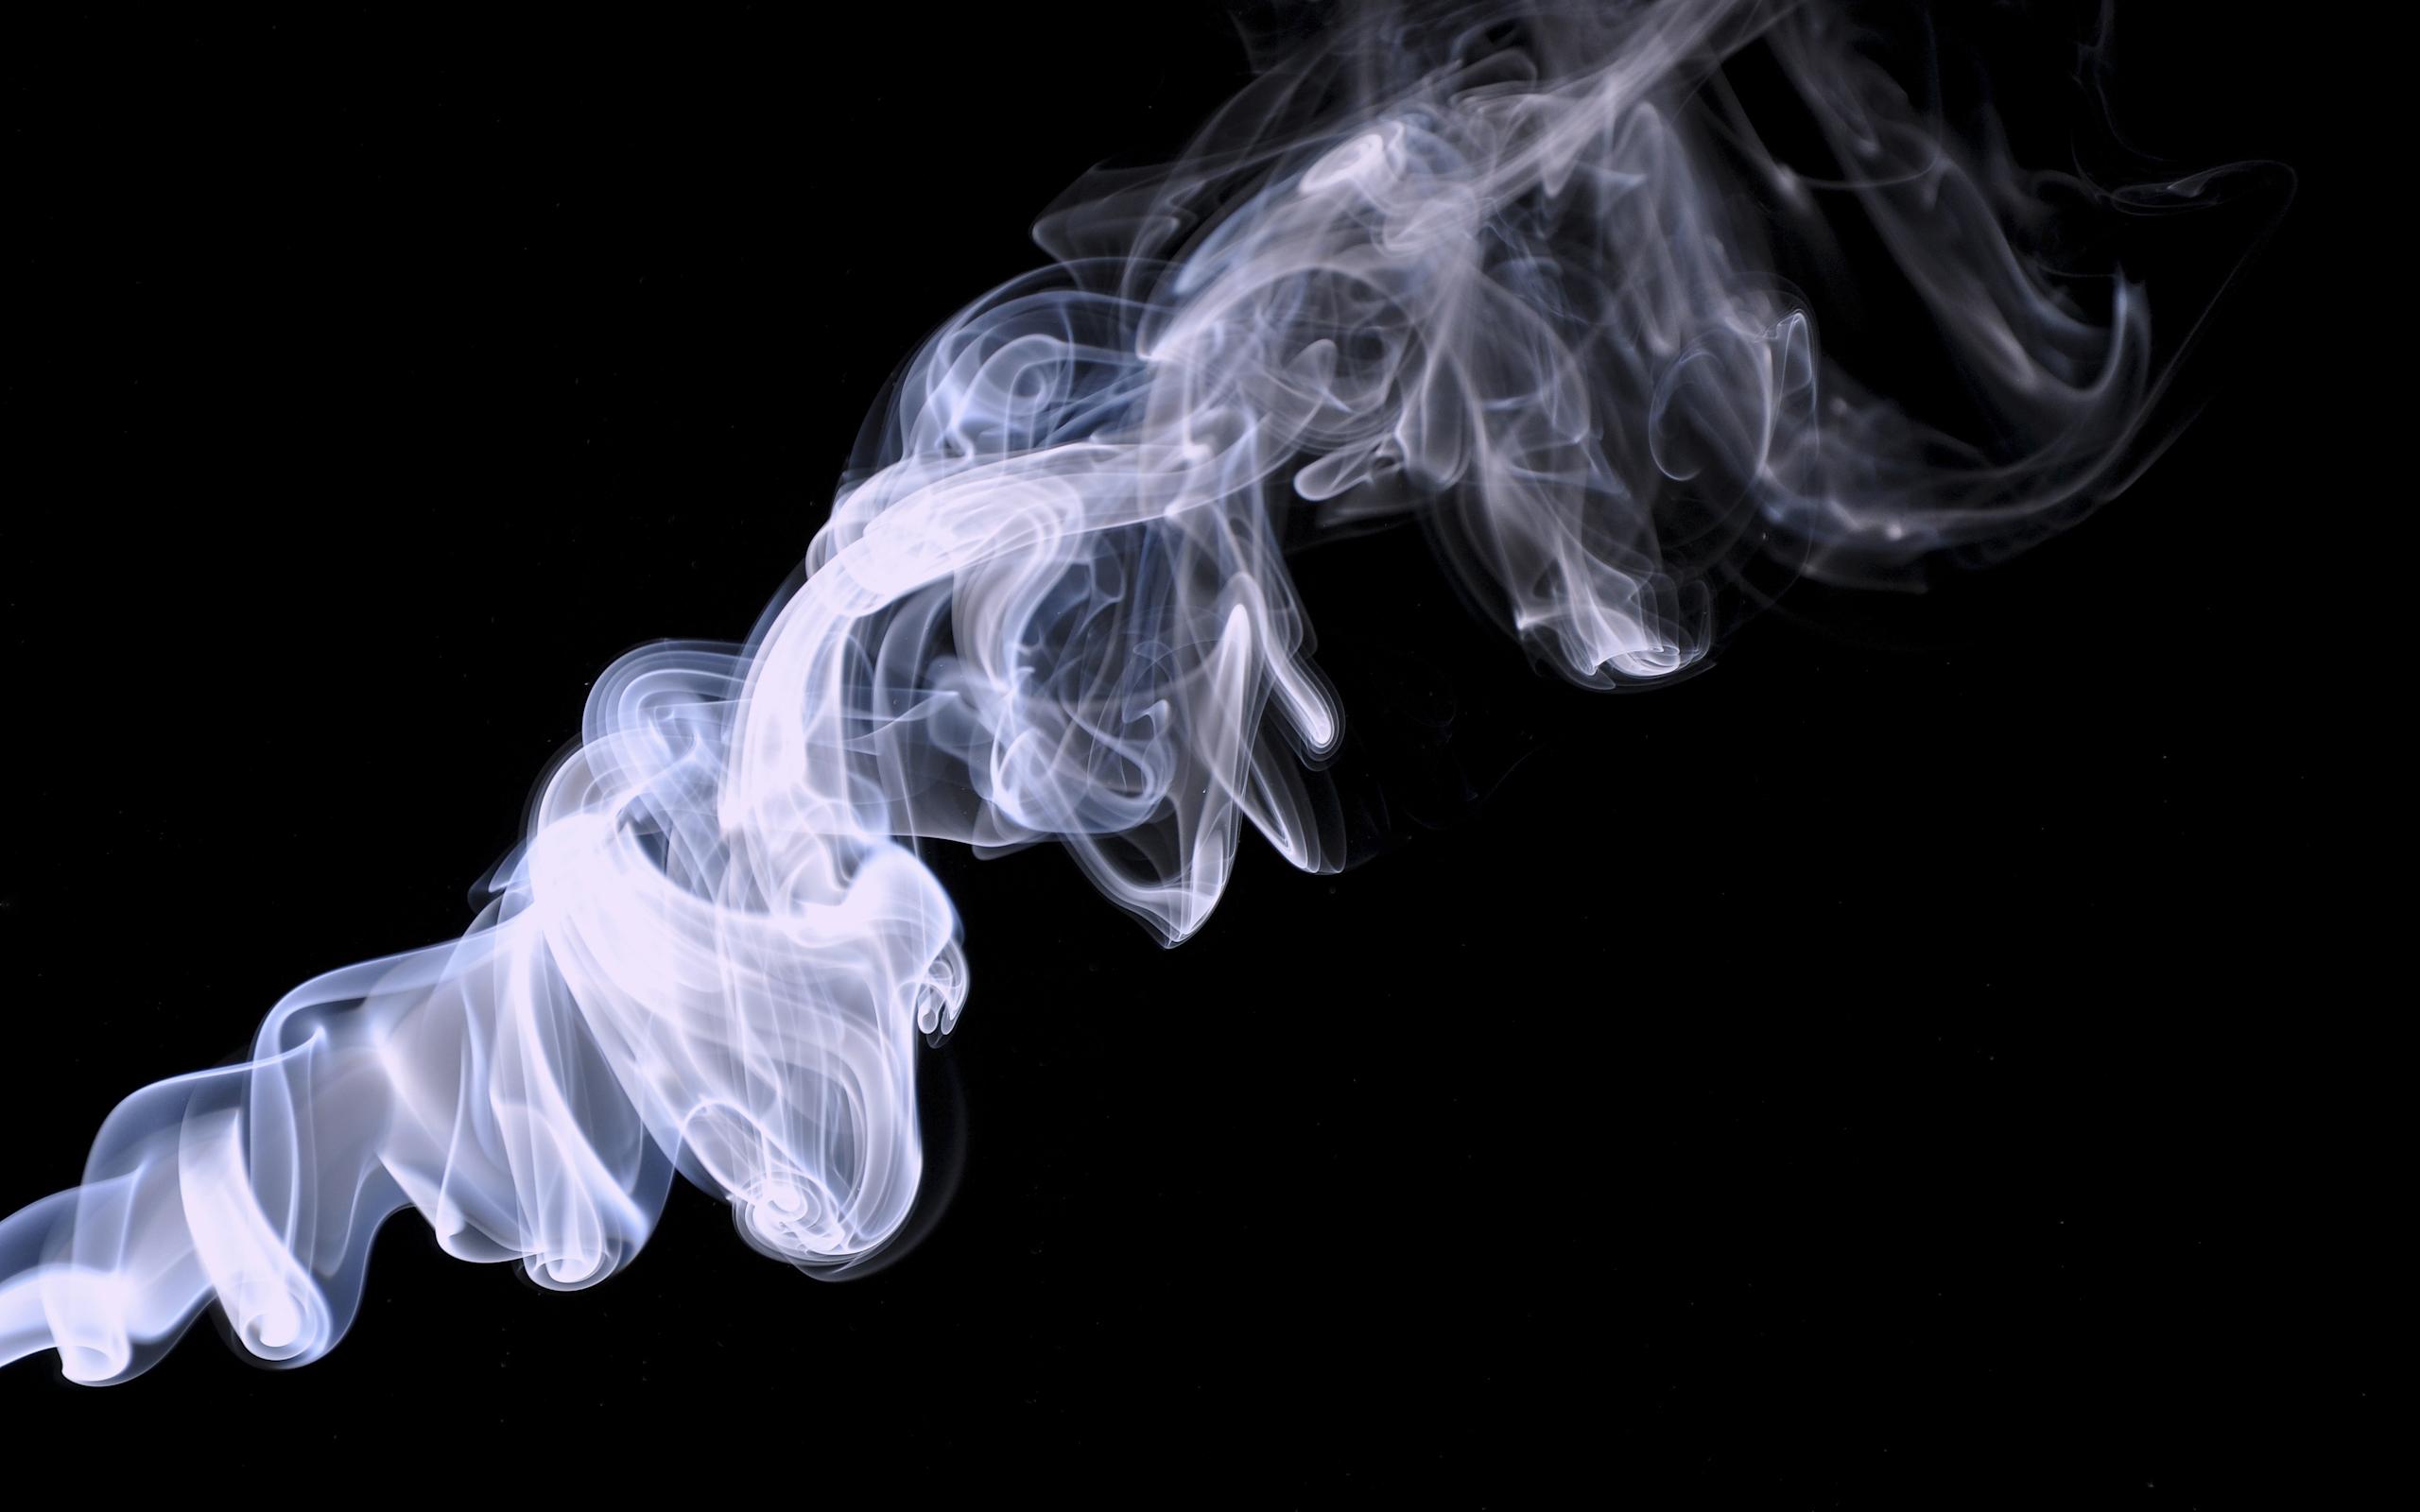 Free Smoke In Theair Wallpaper